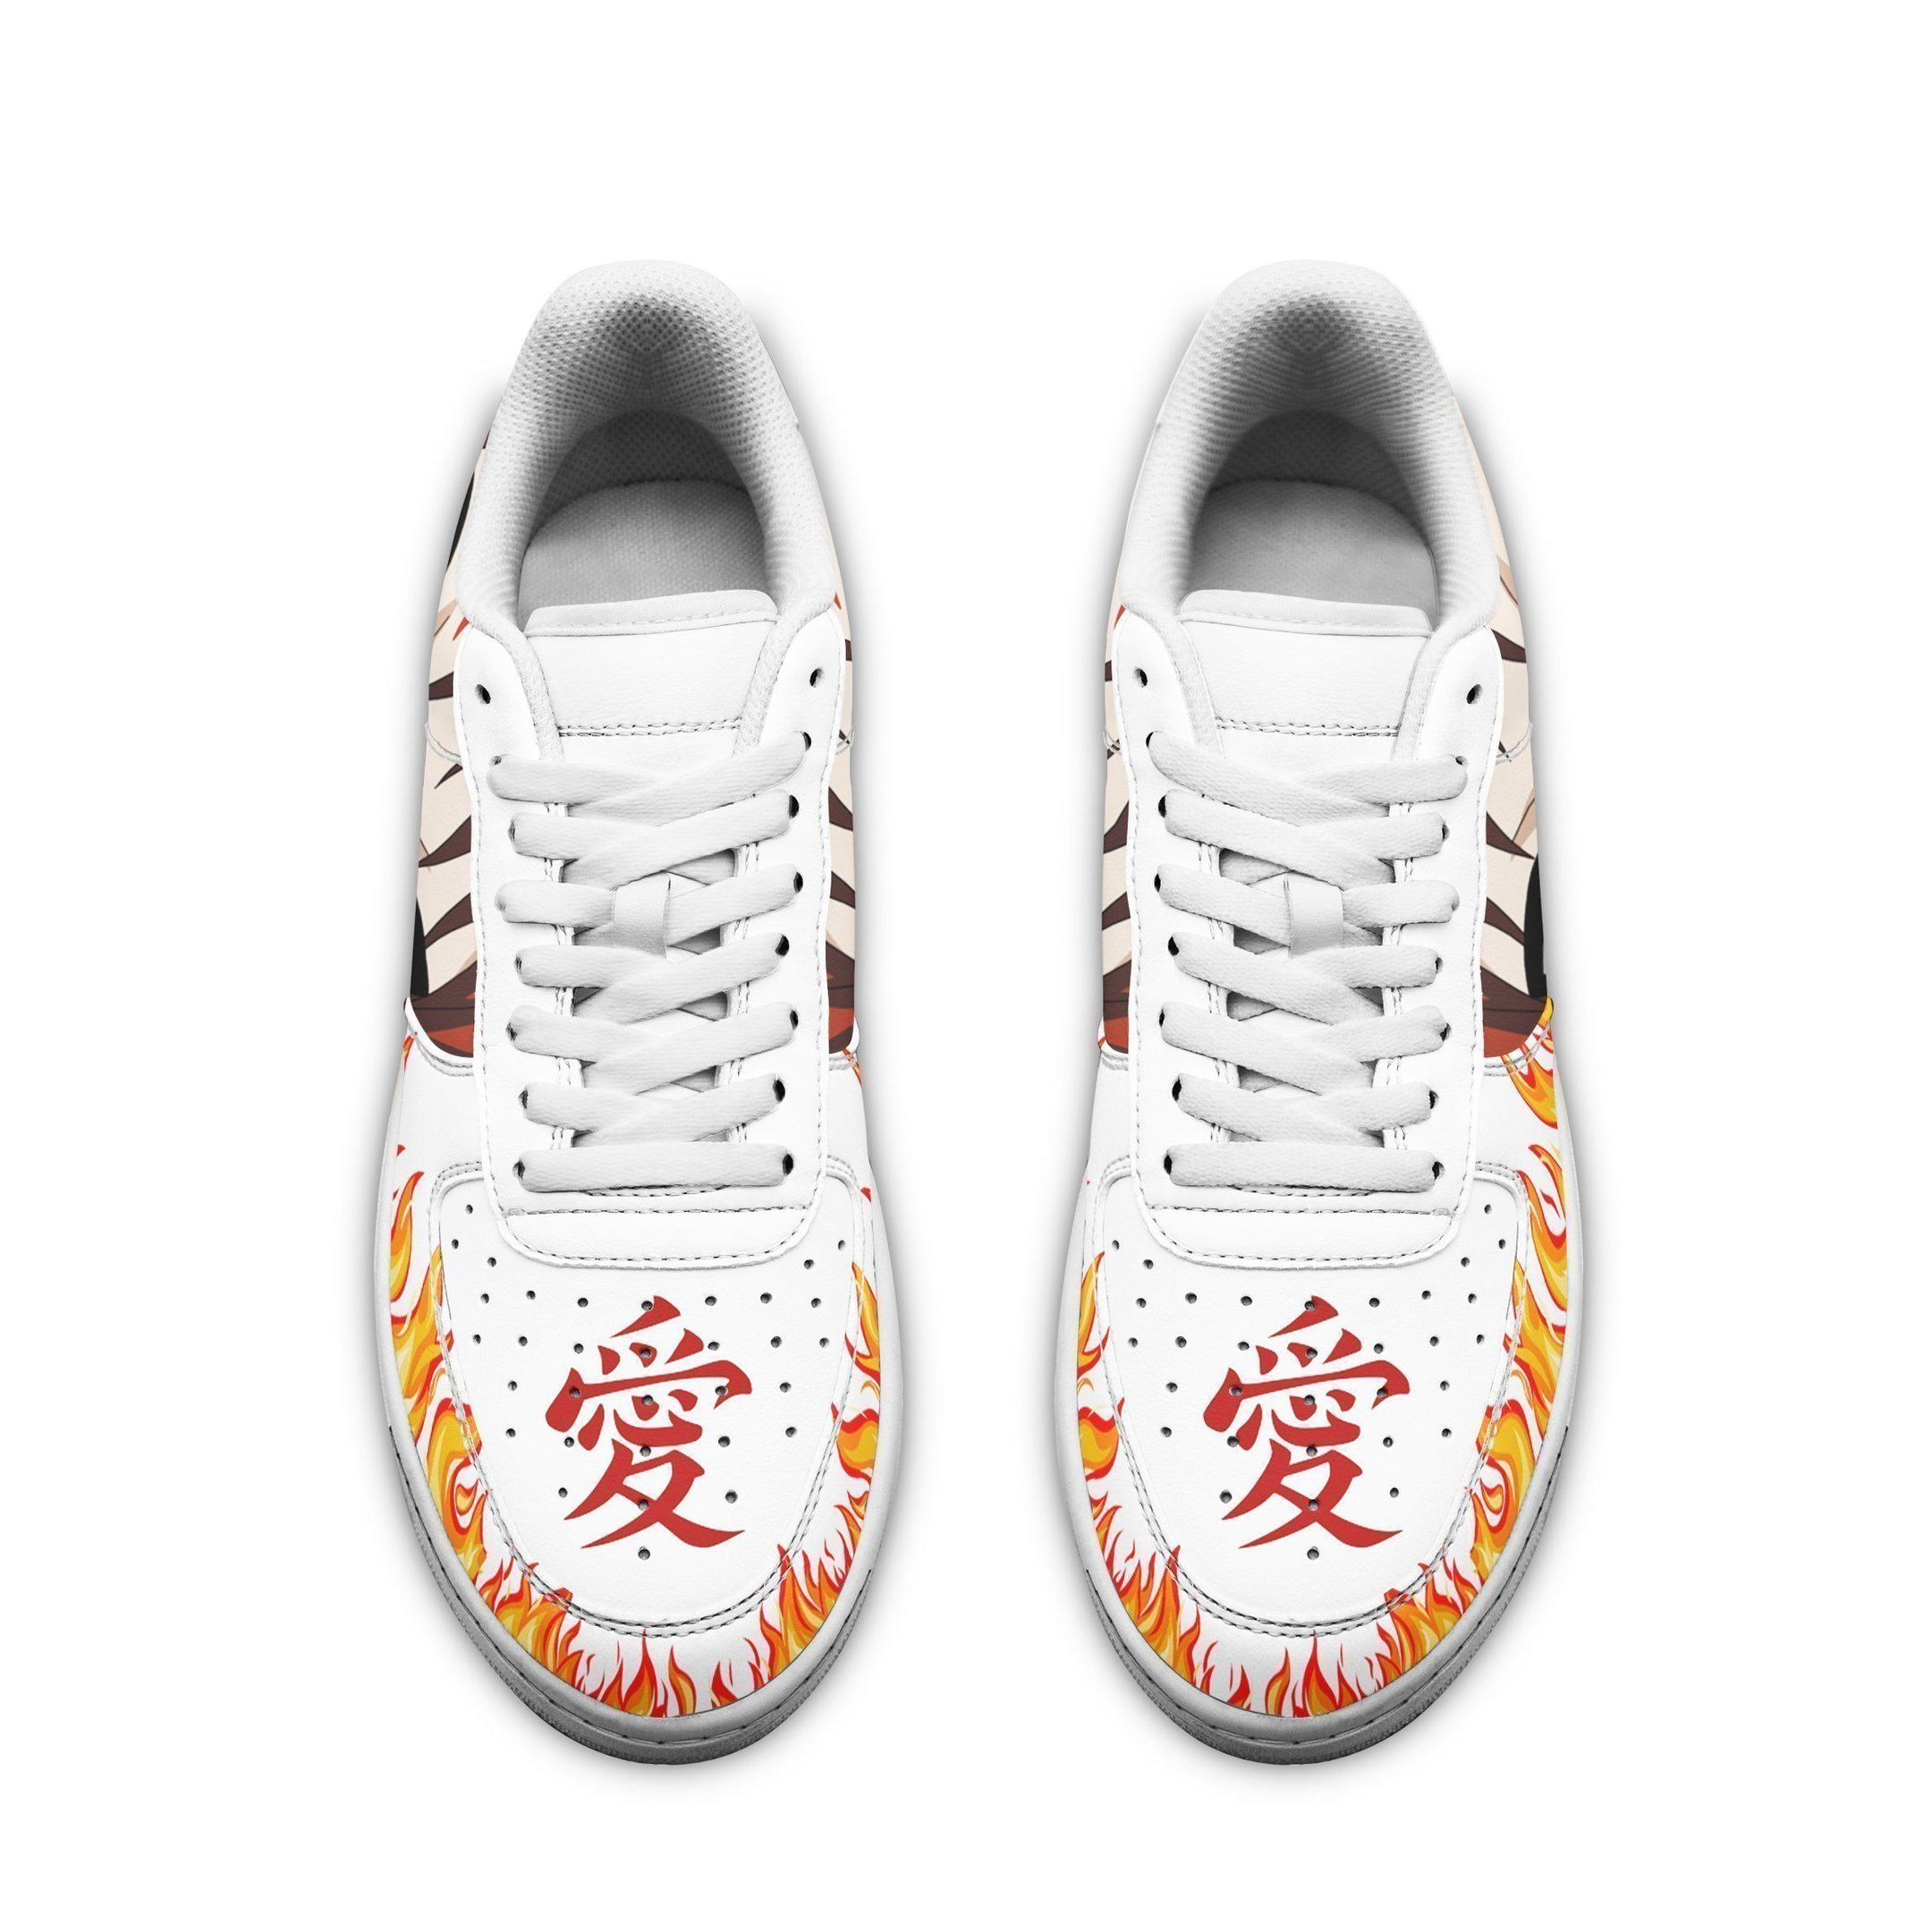 Gaara Eyes Air Shoes Naruto Anime Shoes Fan Gift GO1012